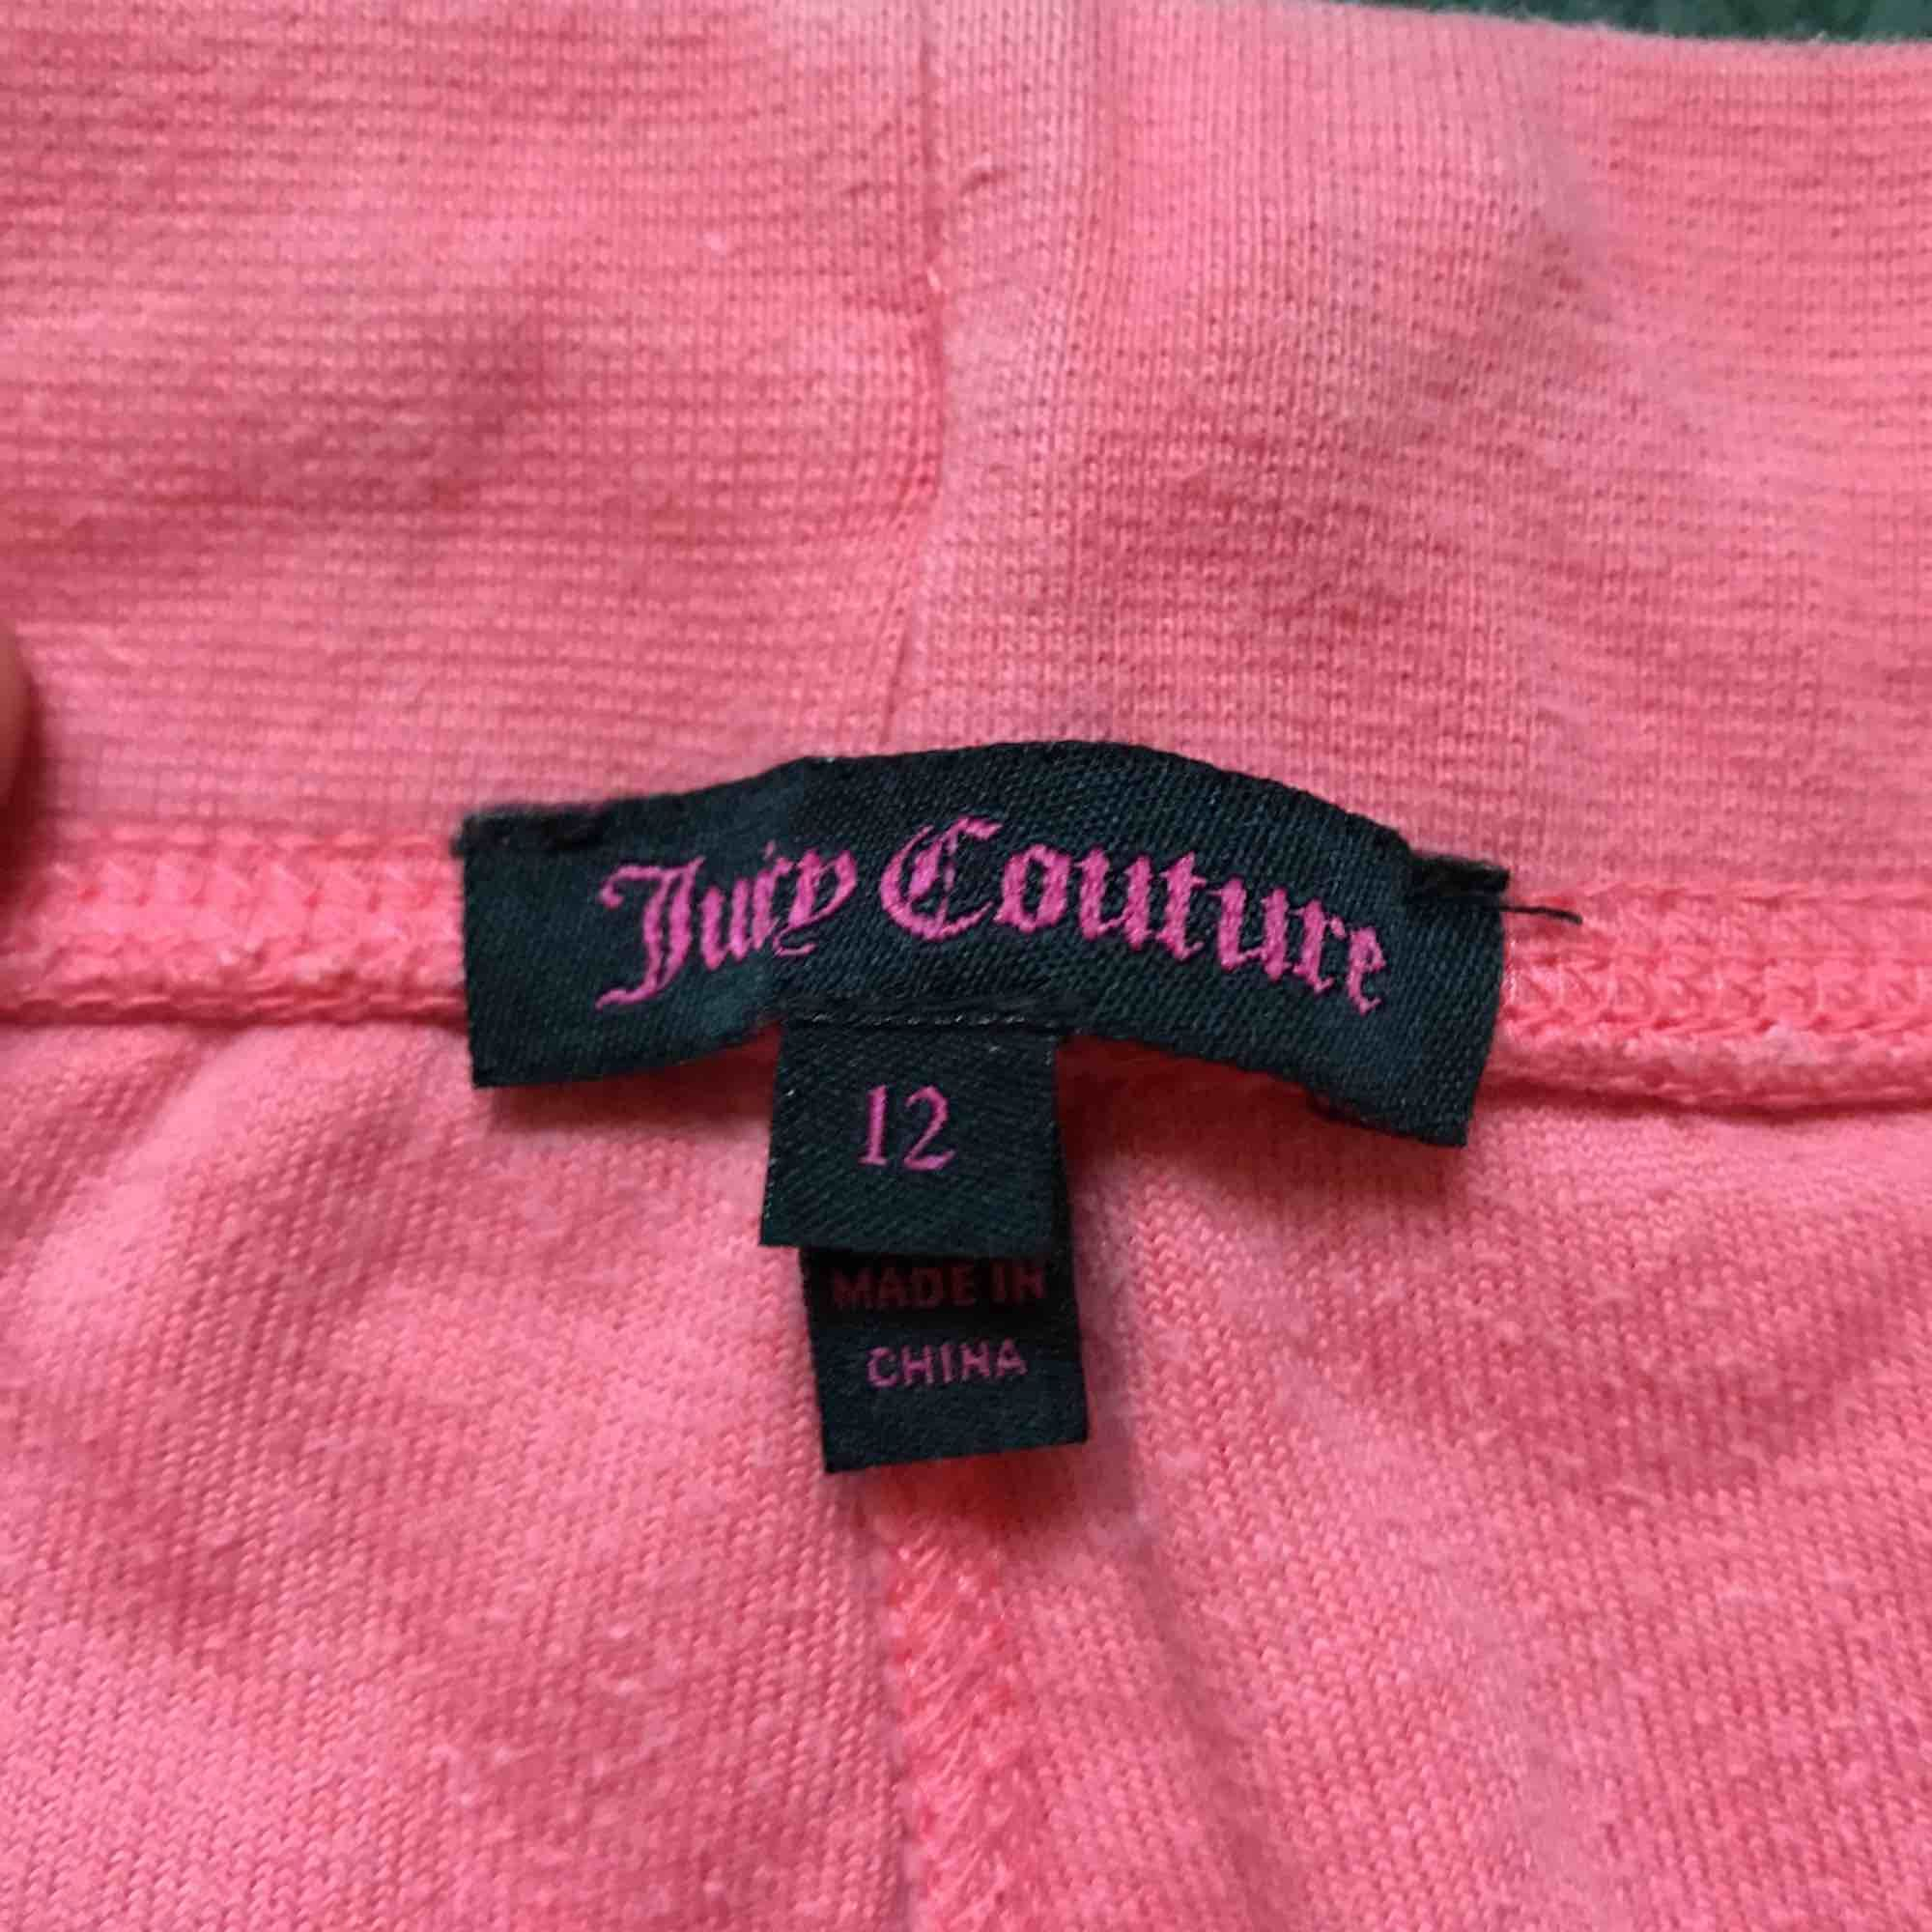 Jättefina korallfärgade juicy couture byxor i bra skick!. Jeans & Byxor.